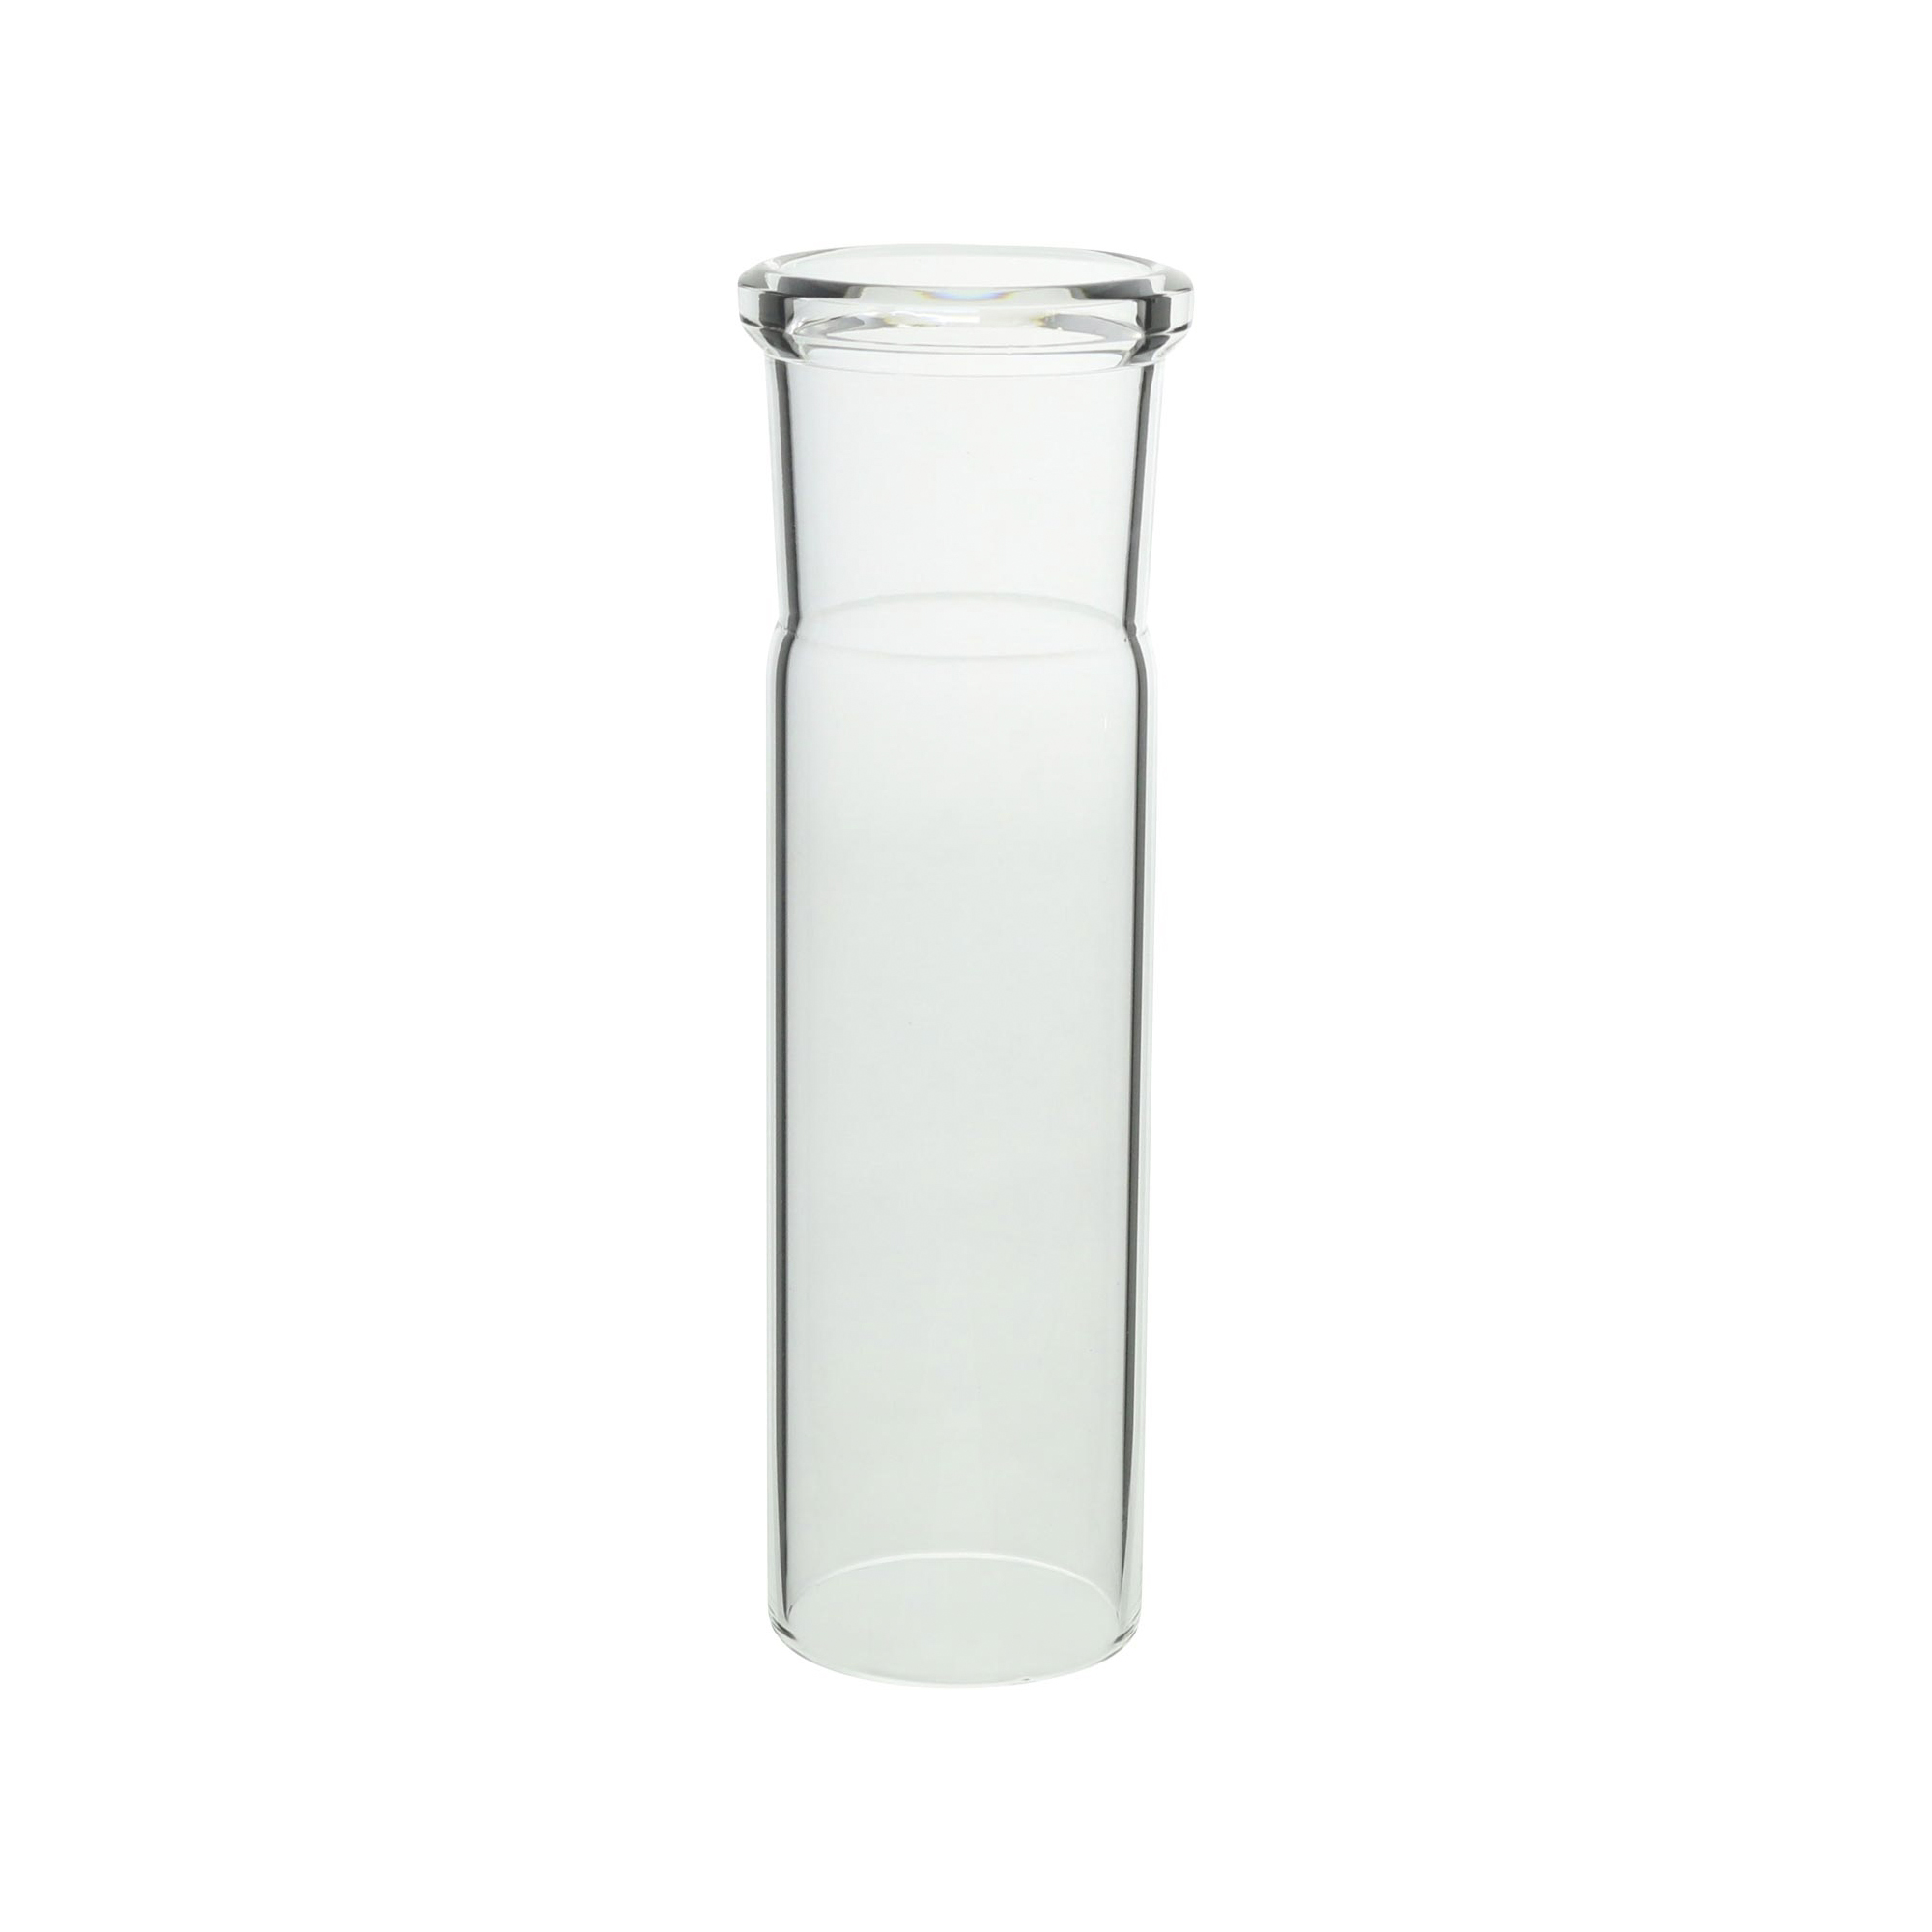 030030-34 SPCガラス接手管 S形 SPC-34 柴田科学(SIBATA)